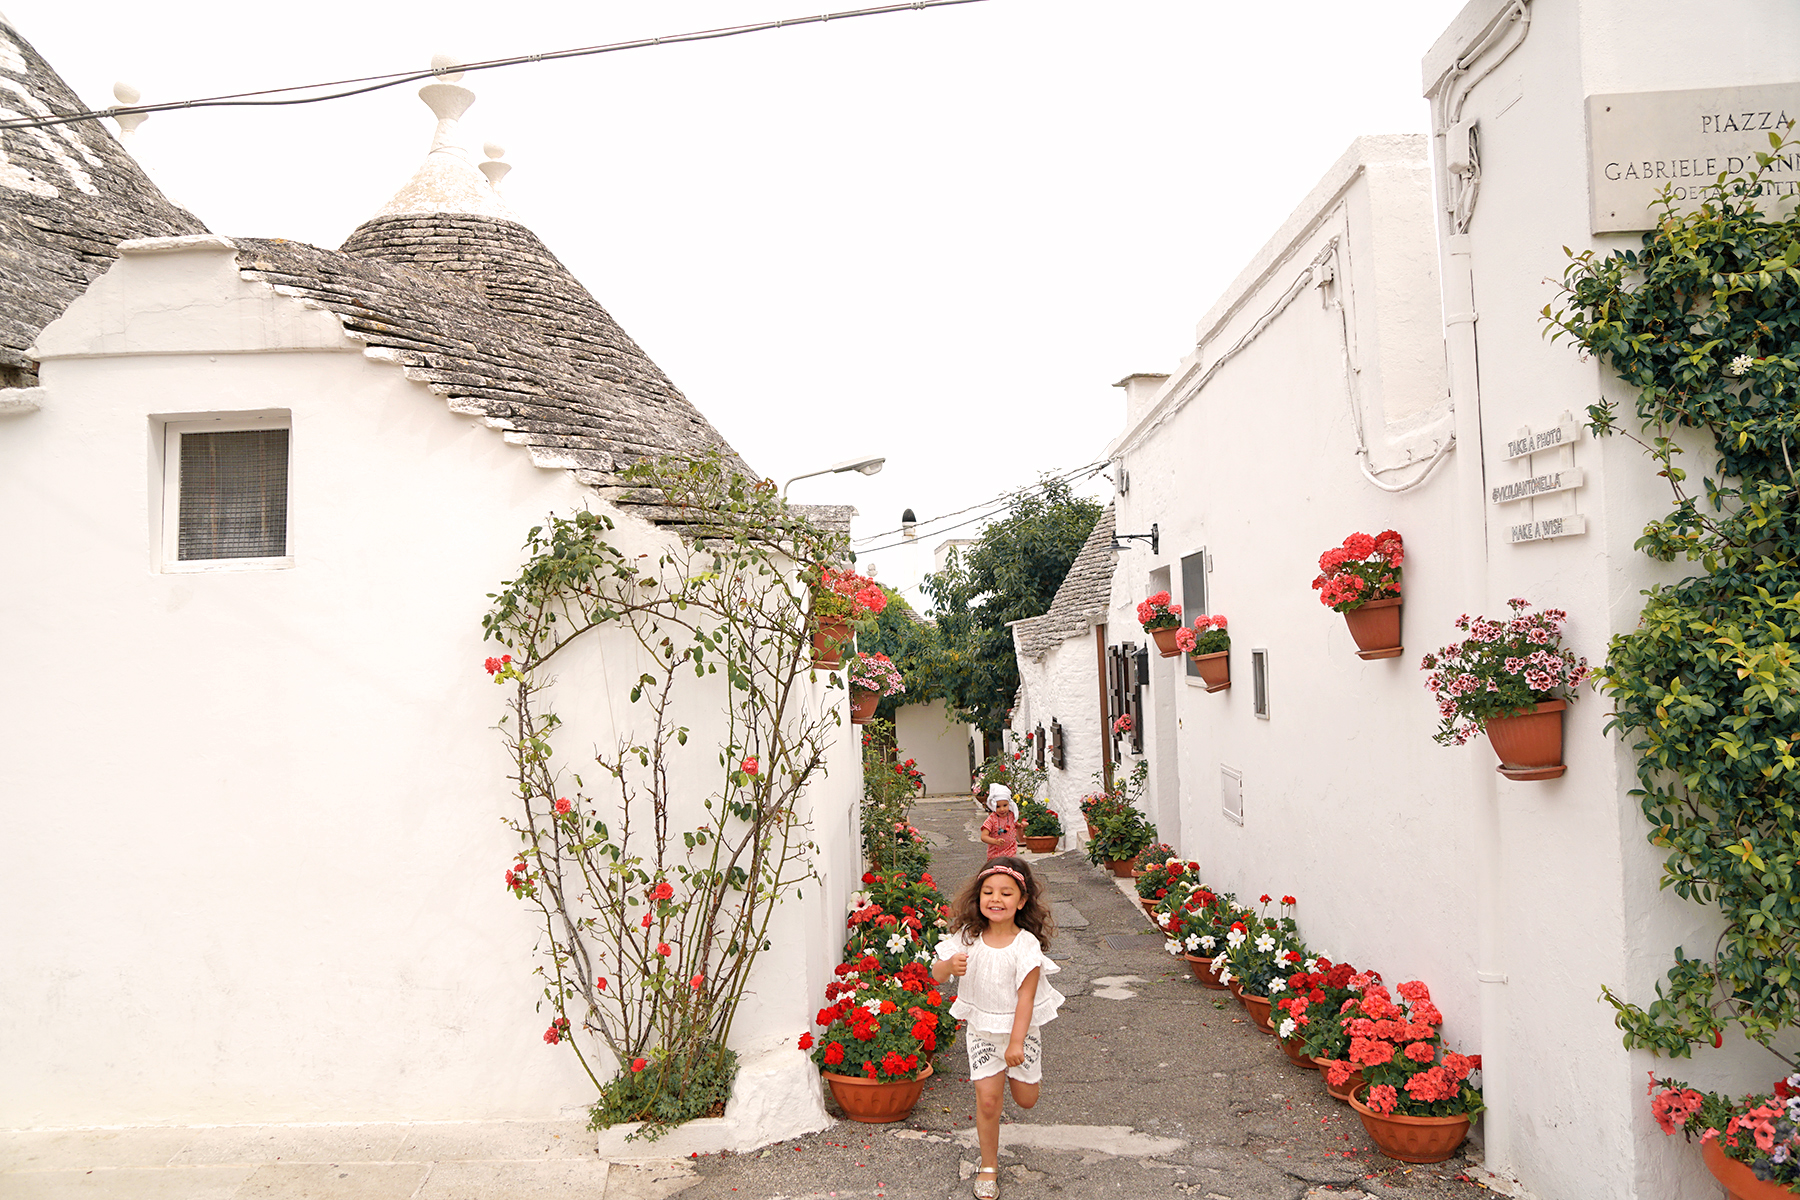 Petites filles à Alberobello, Pouilles Italie